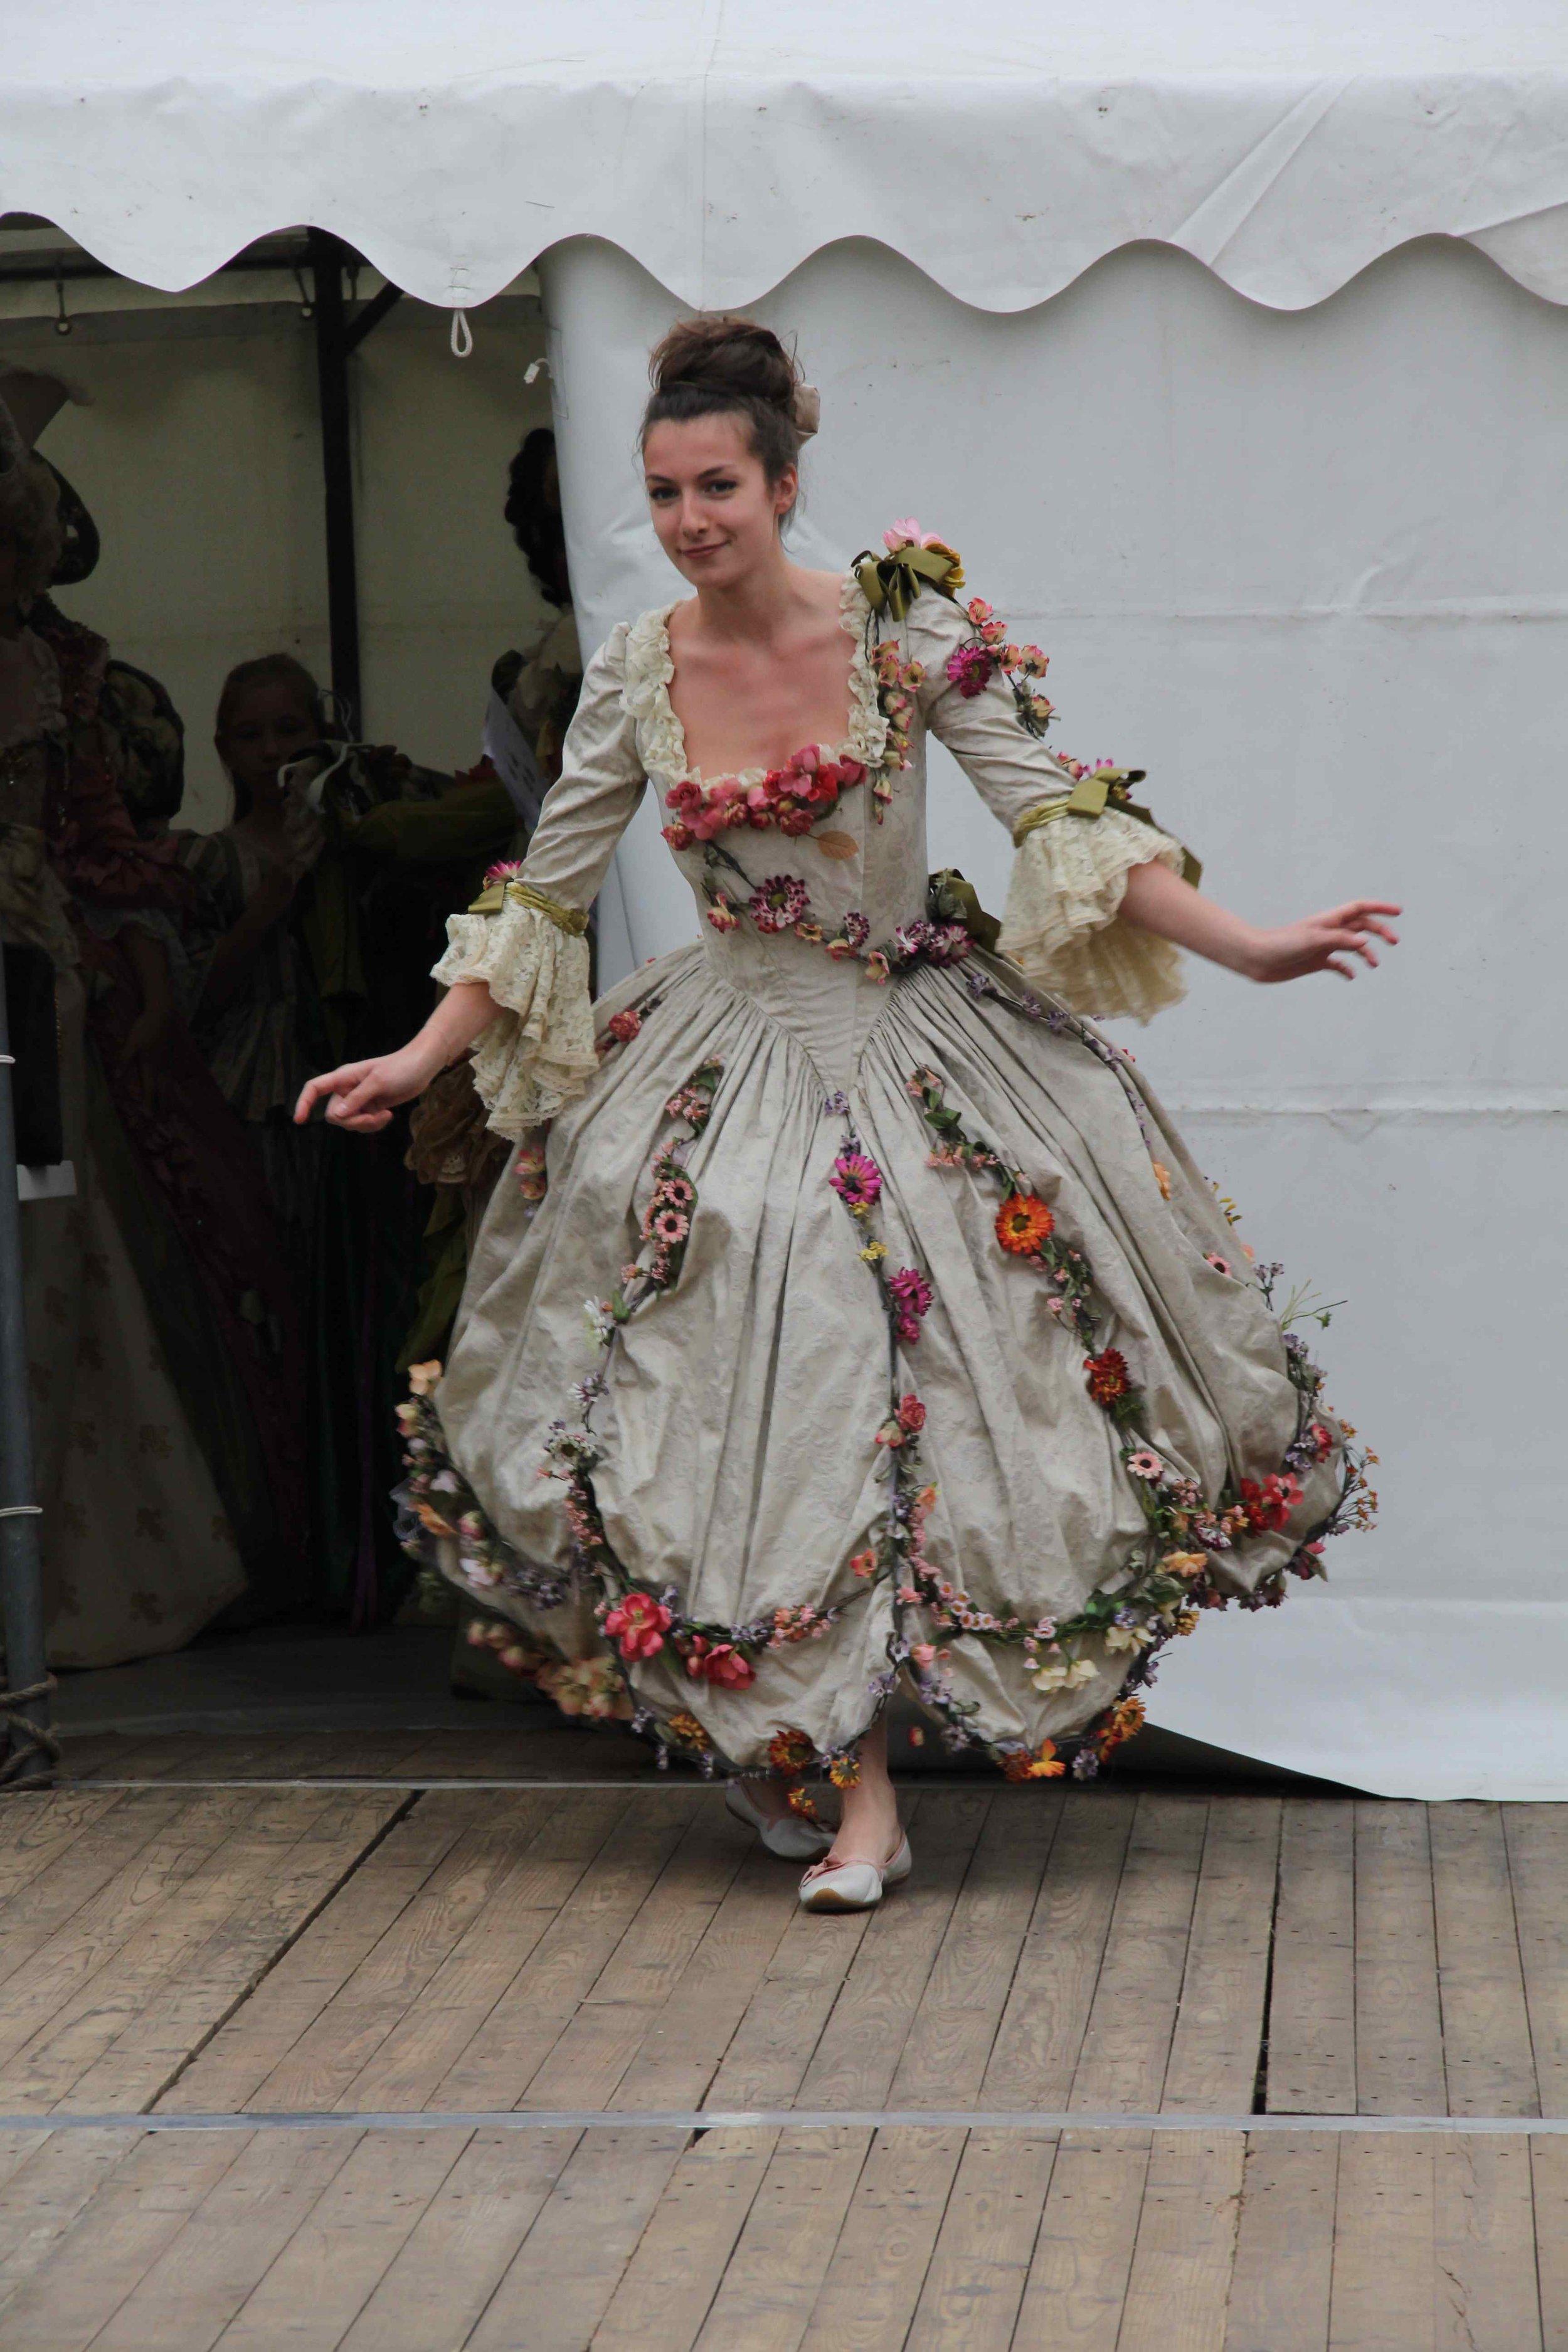 Costume de ballerine 18e siècle sur mesure Agnes Szabelewski.jpg